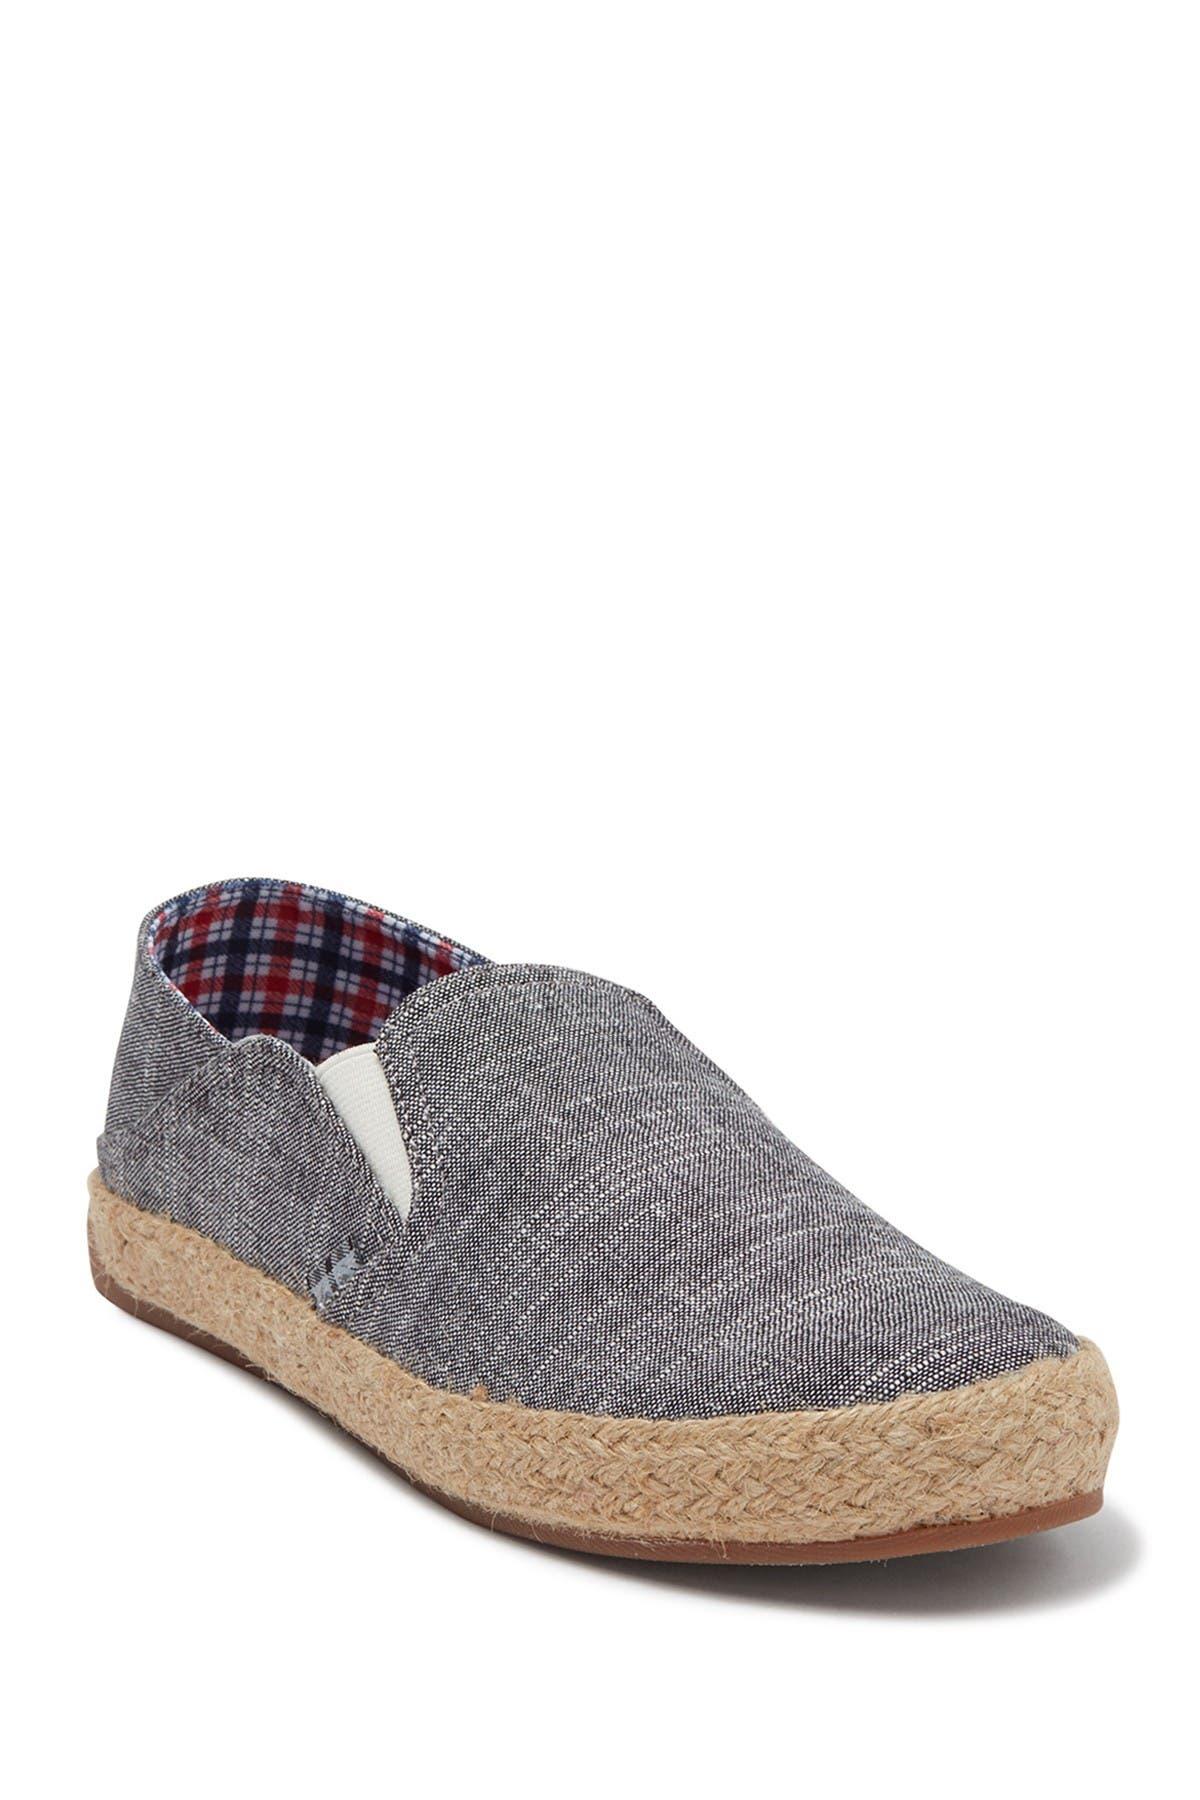 Image of Ben Sherman Jenson Convertible Heel Slip-On Sneaker